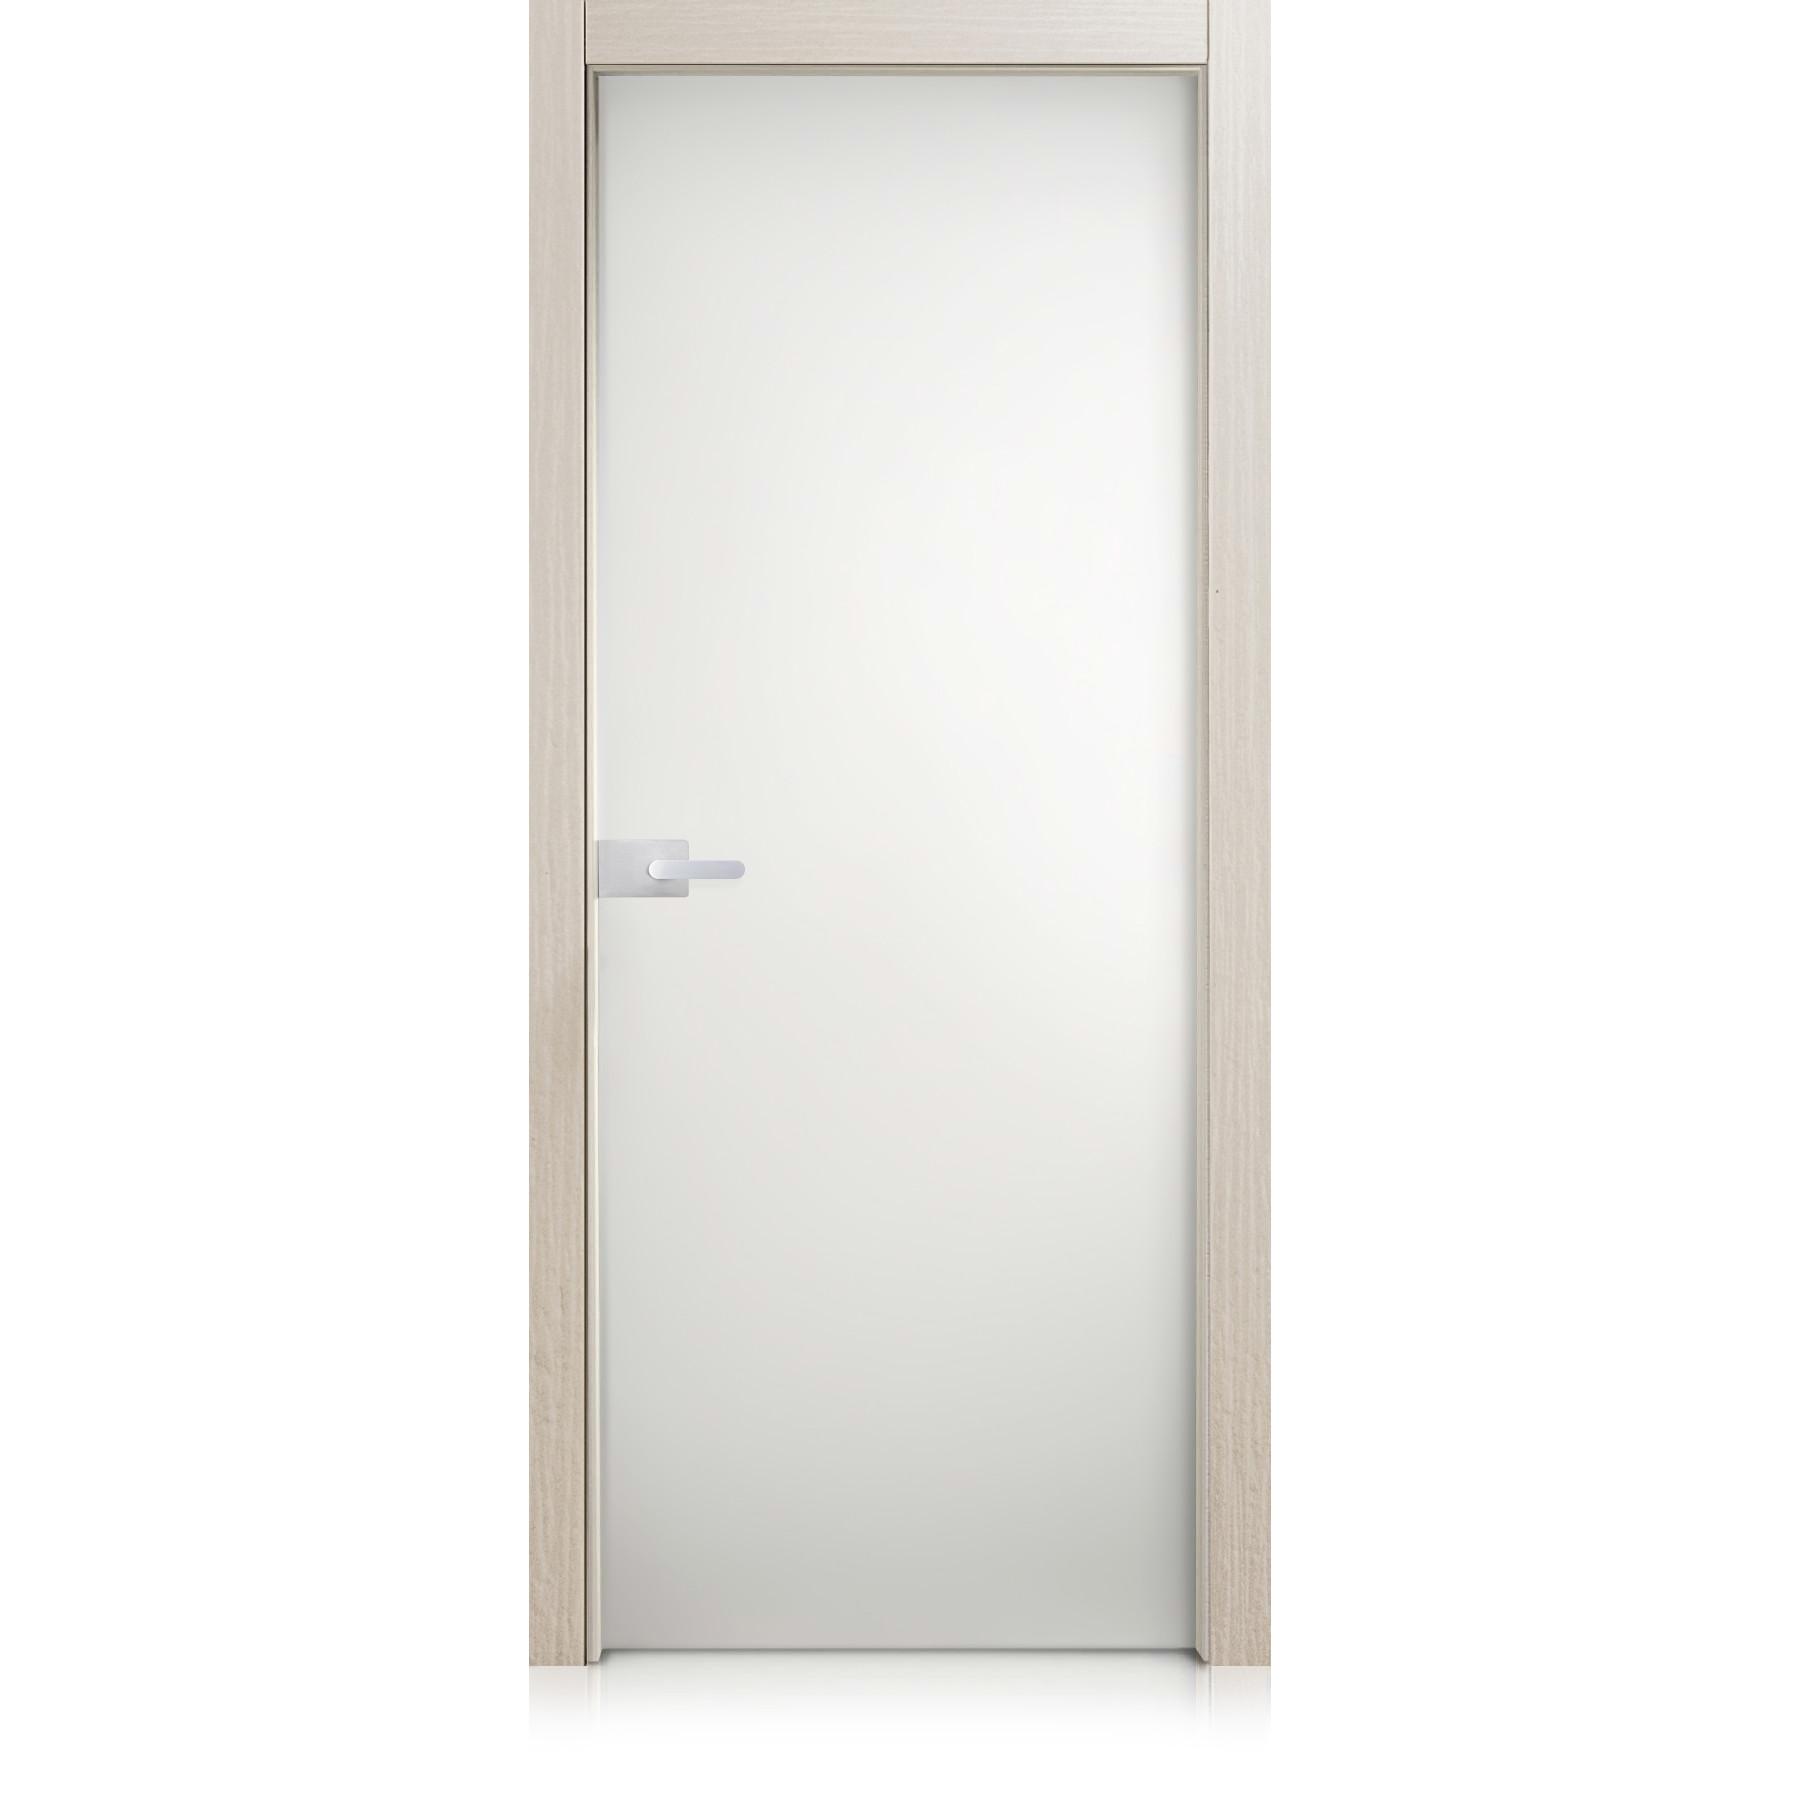 Tür Cristal Basic materic greige